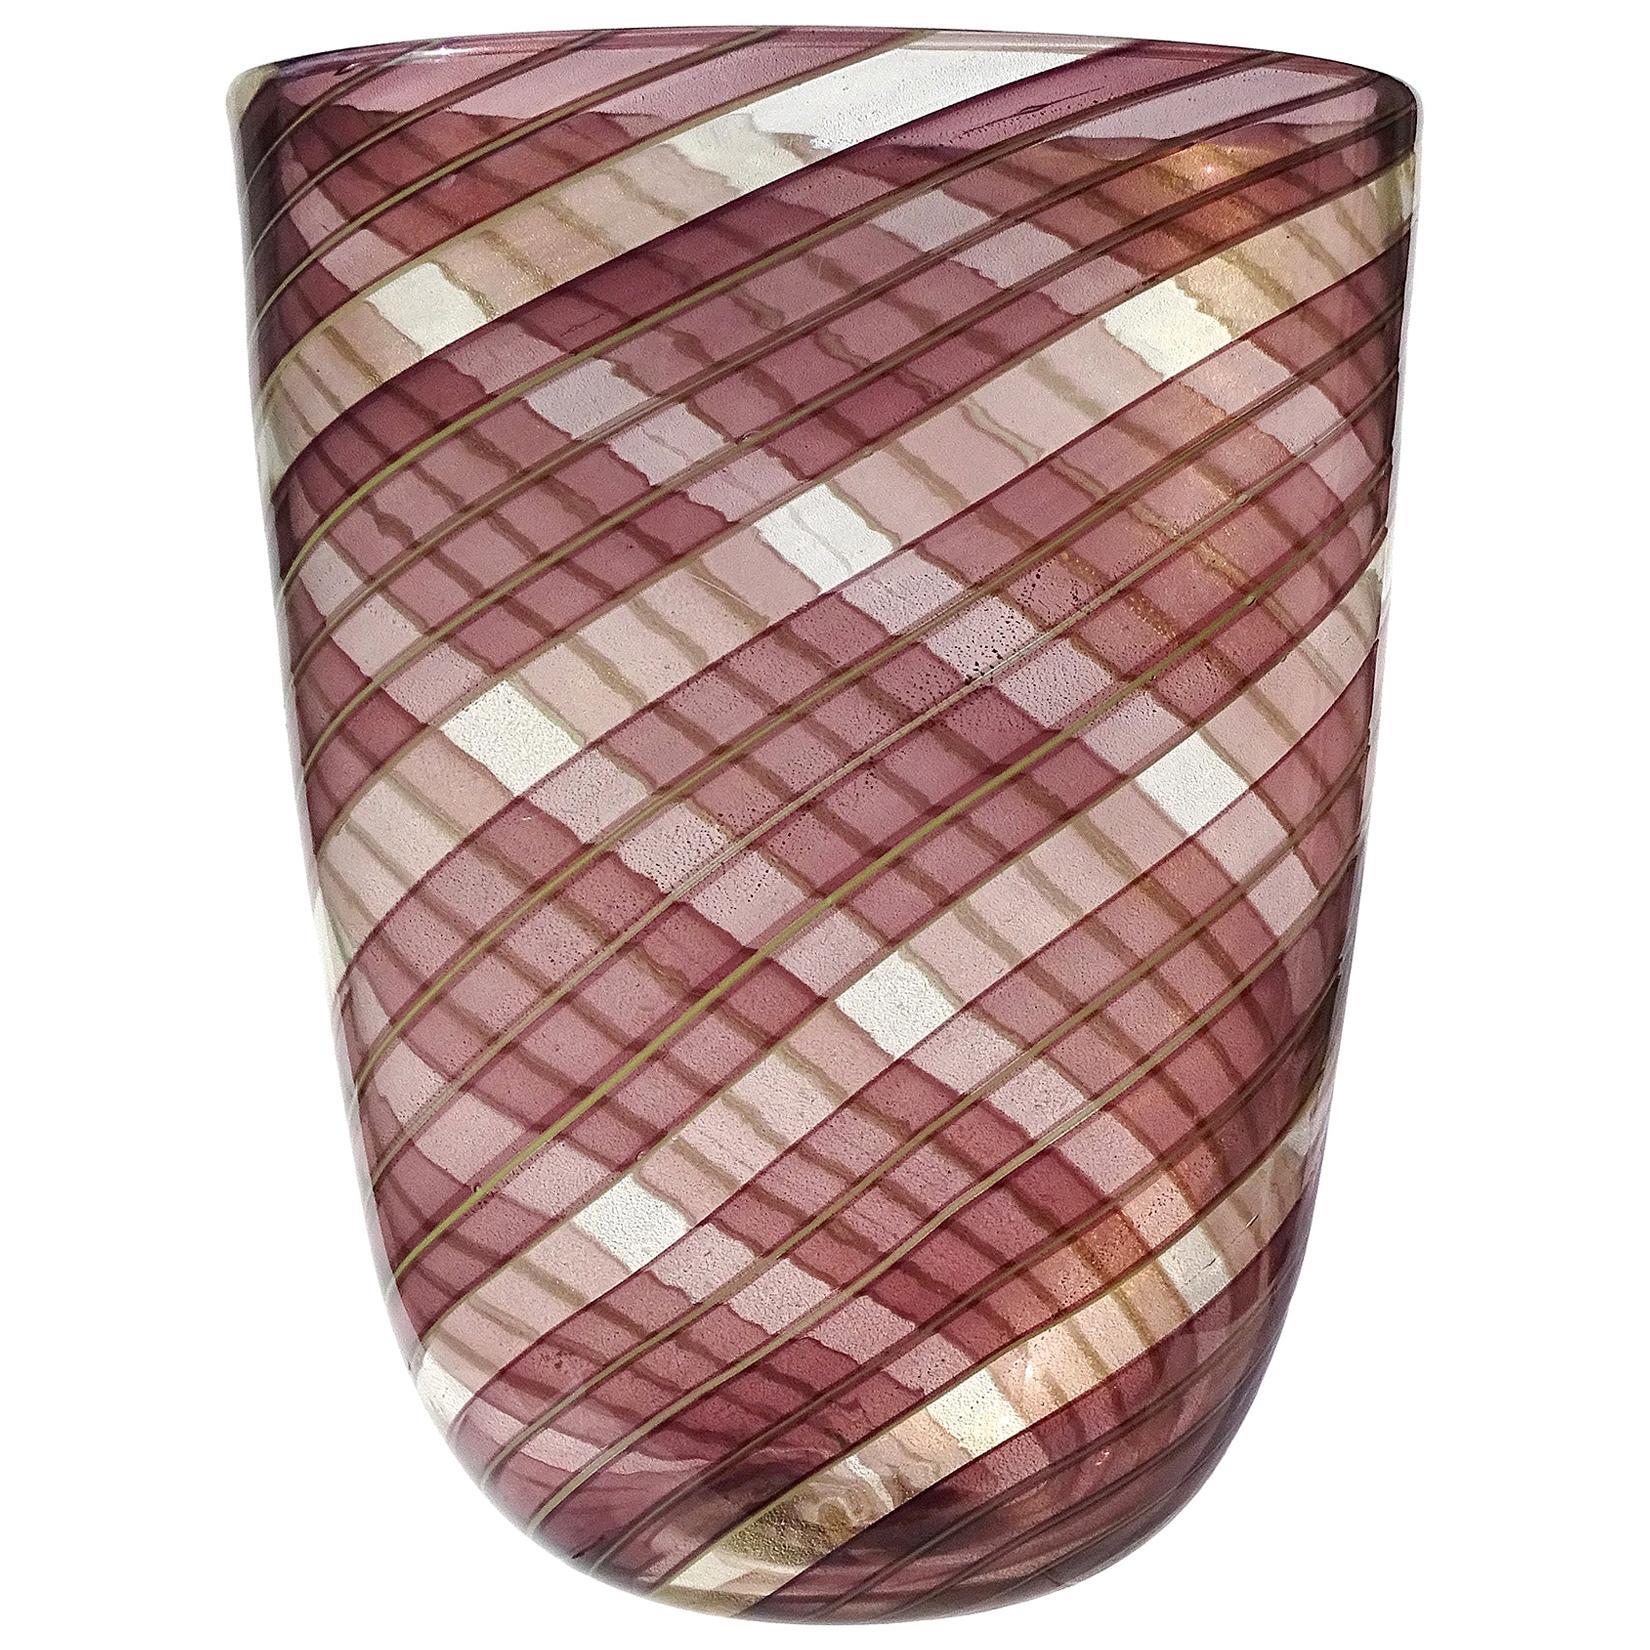 Ercole Barovier Toso Murano 1954 Purple Gold Flecks Italian Art Glass Vase